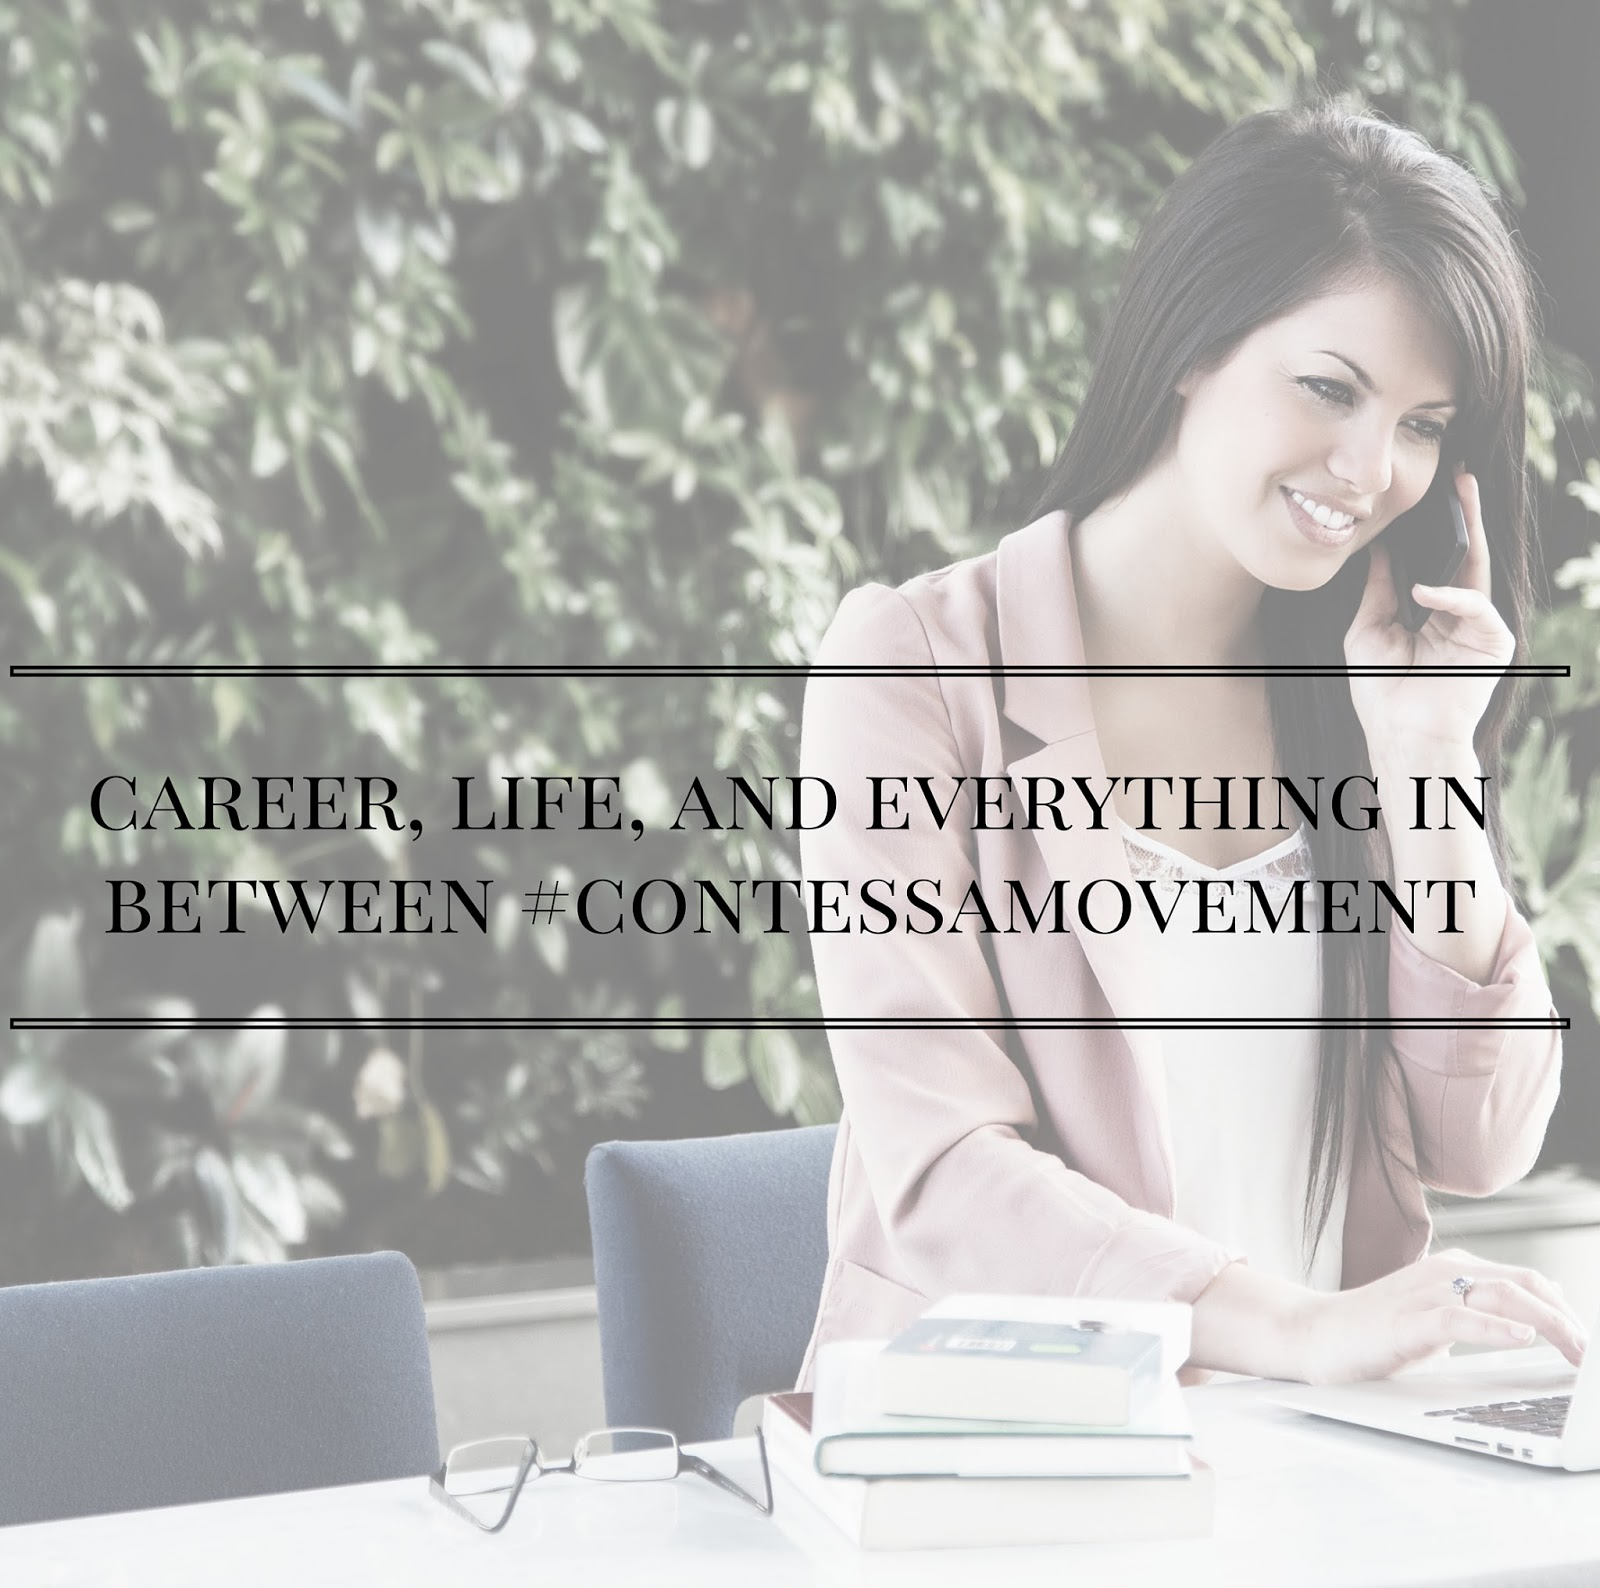 Career, Life, And Everything In Between #ContessaMovement | http://www.alyssajfreitas.com/2015/09/career-life-and-everything-in-between.html